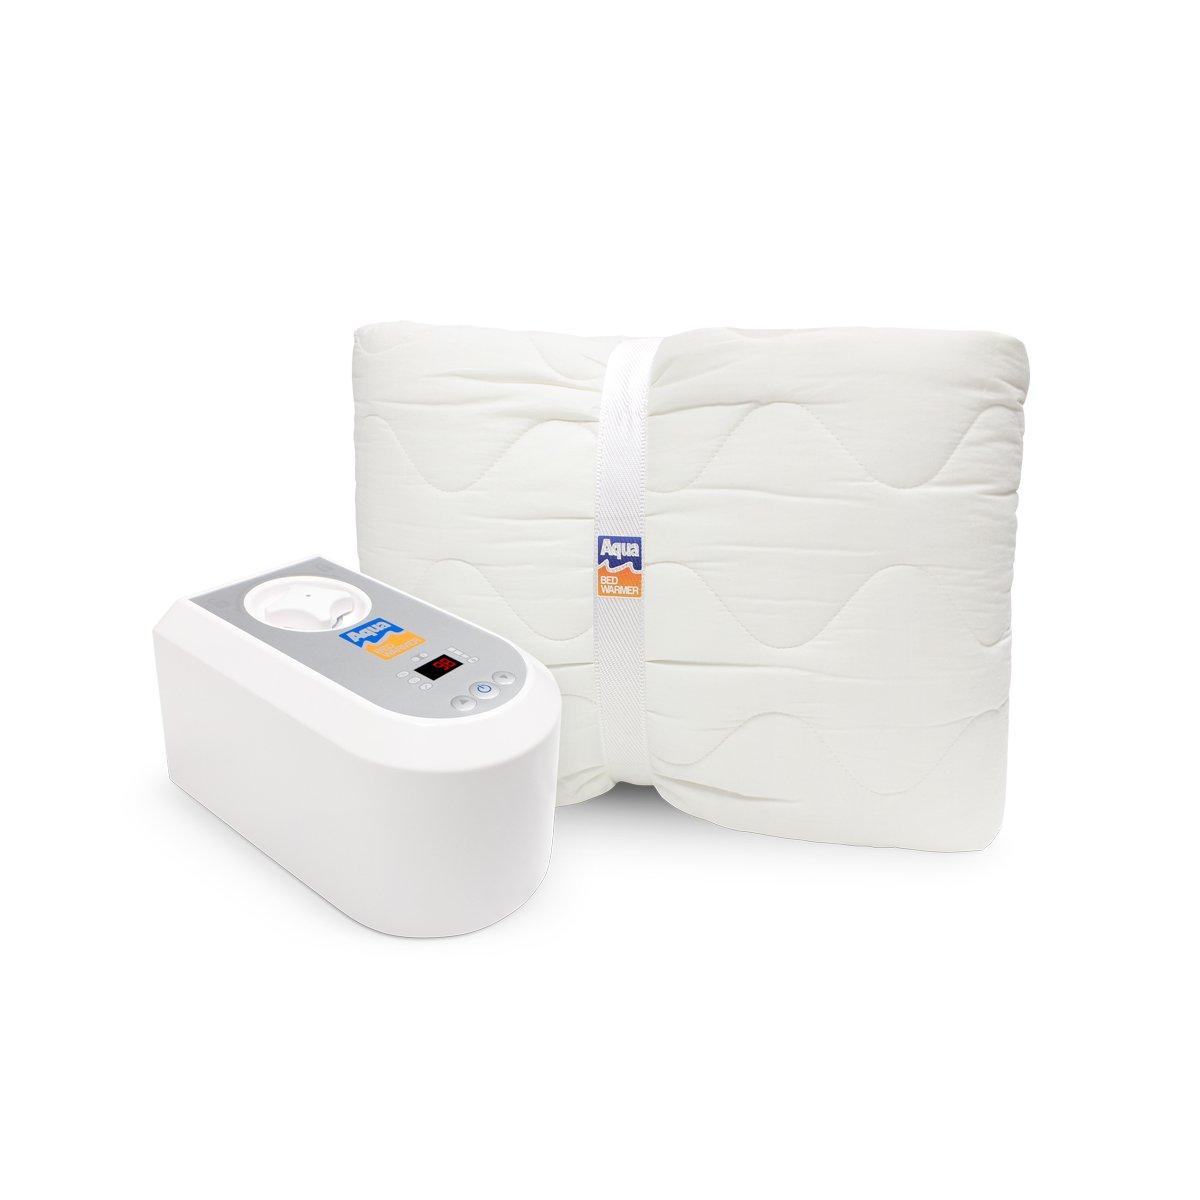 Aqua Bed Warmer Non-electric Heater Blanket (Twin)